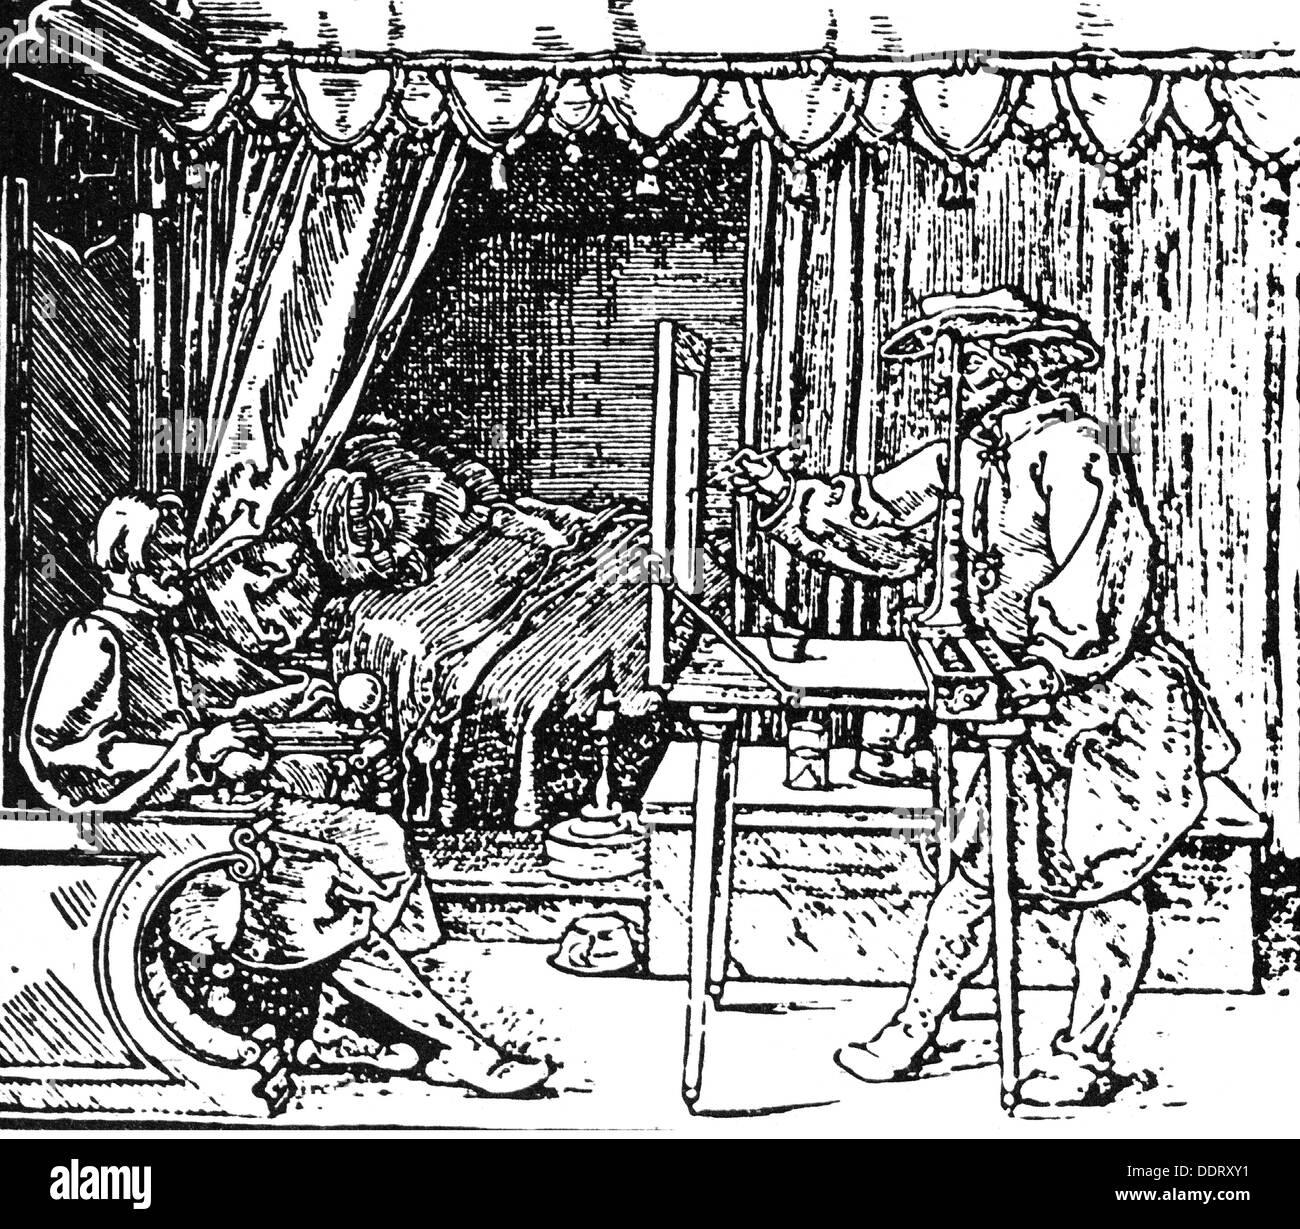 Dürer, Albrecht, 21.5.1471 - 6.4.1528, German painter and graphic artist, 'Underweysung der Messung' (Book on Measurement), woodcut, Nuremberg, 1525, Artist's Copyright has not to be cleared - Stock Image